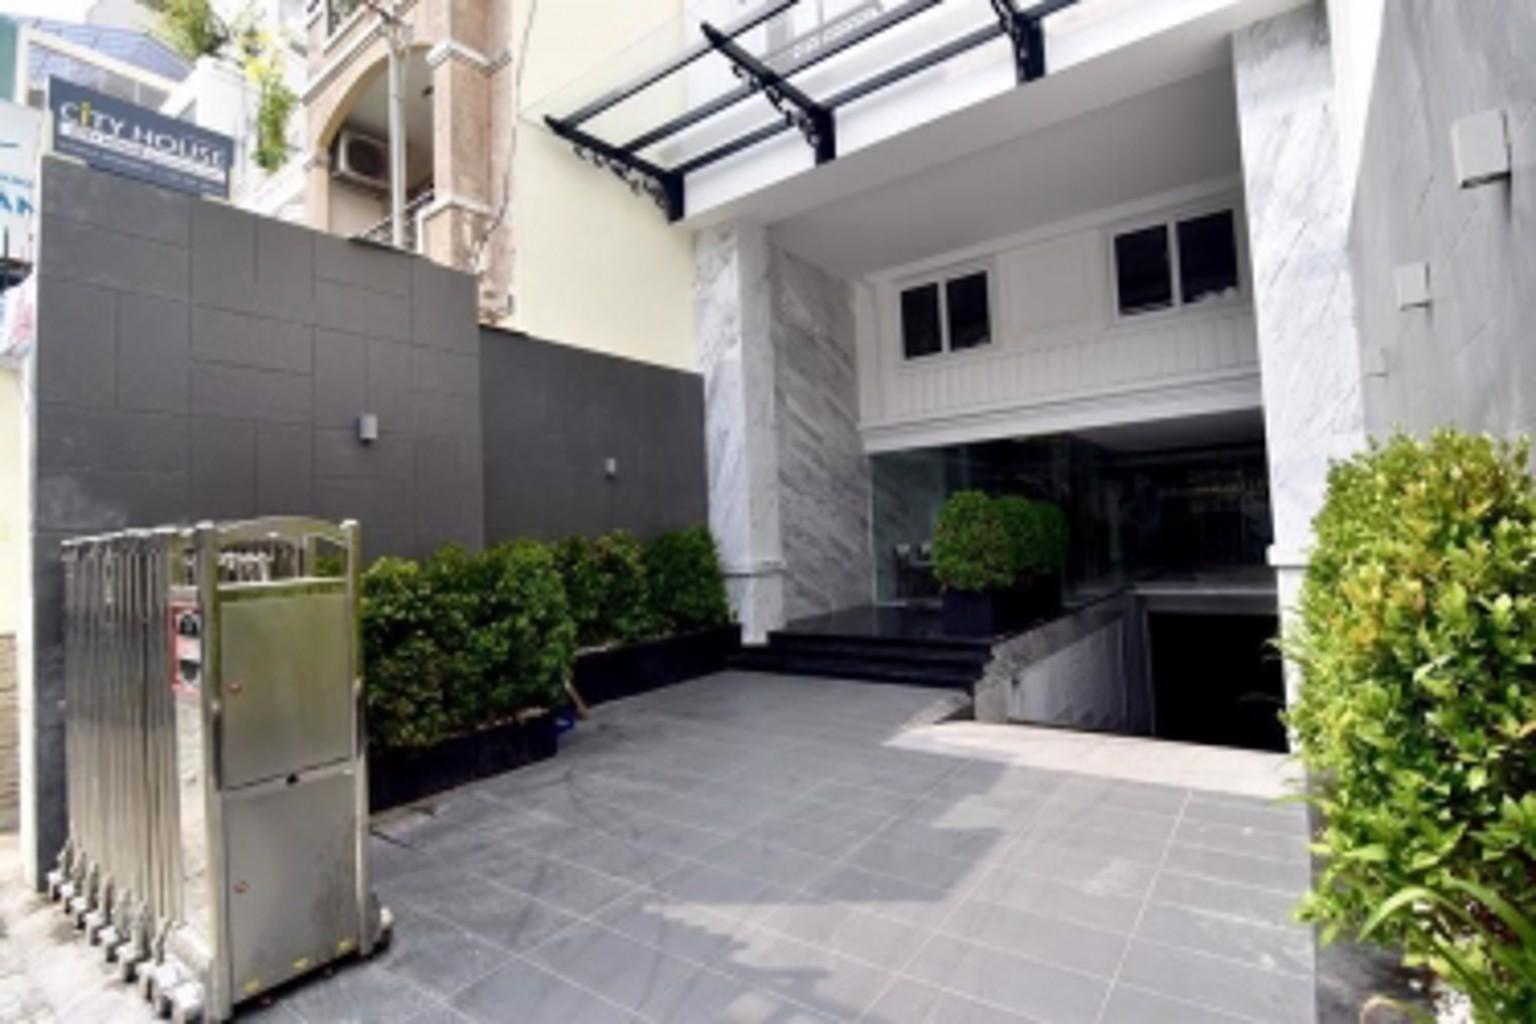 City House Apartment Hoang Linh